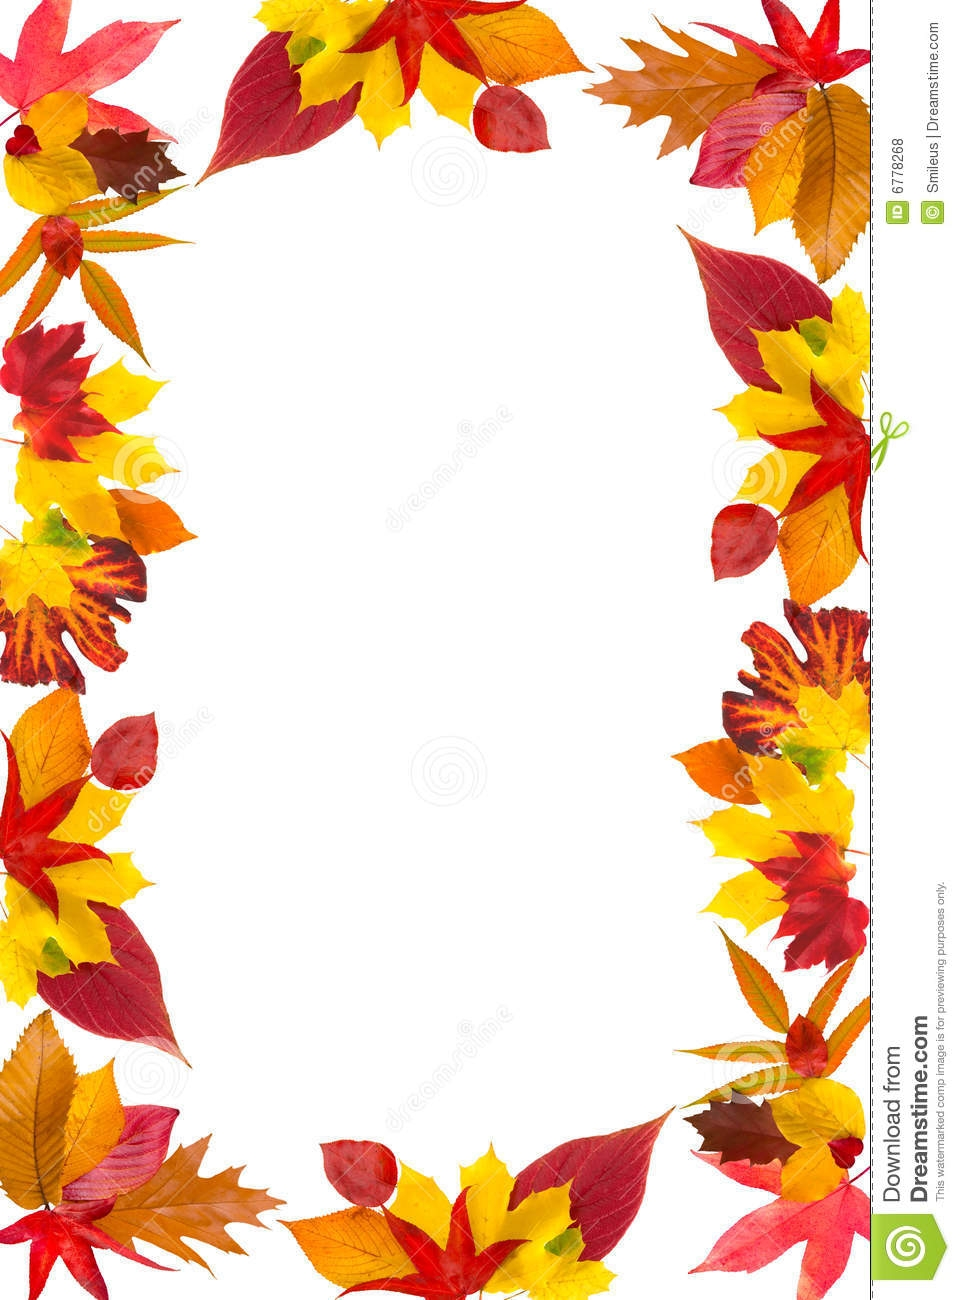 960x1300 Explore Border Of Autumn Leaves